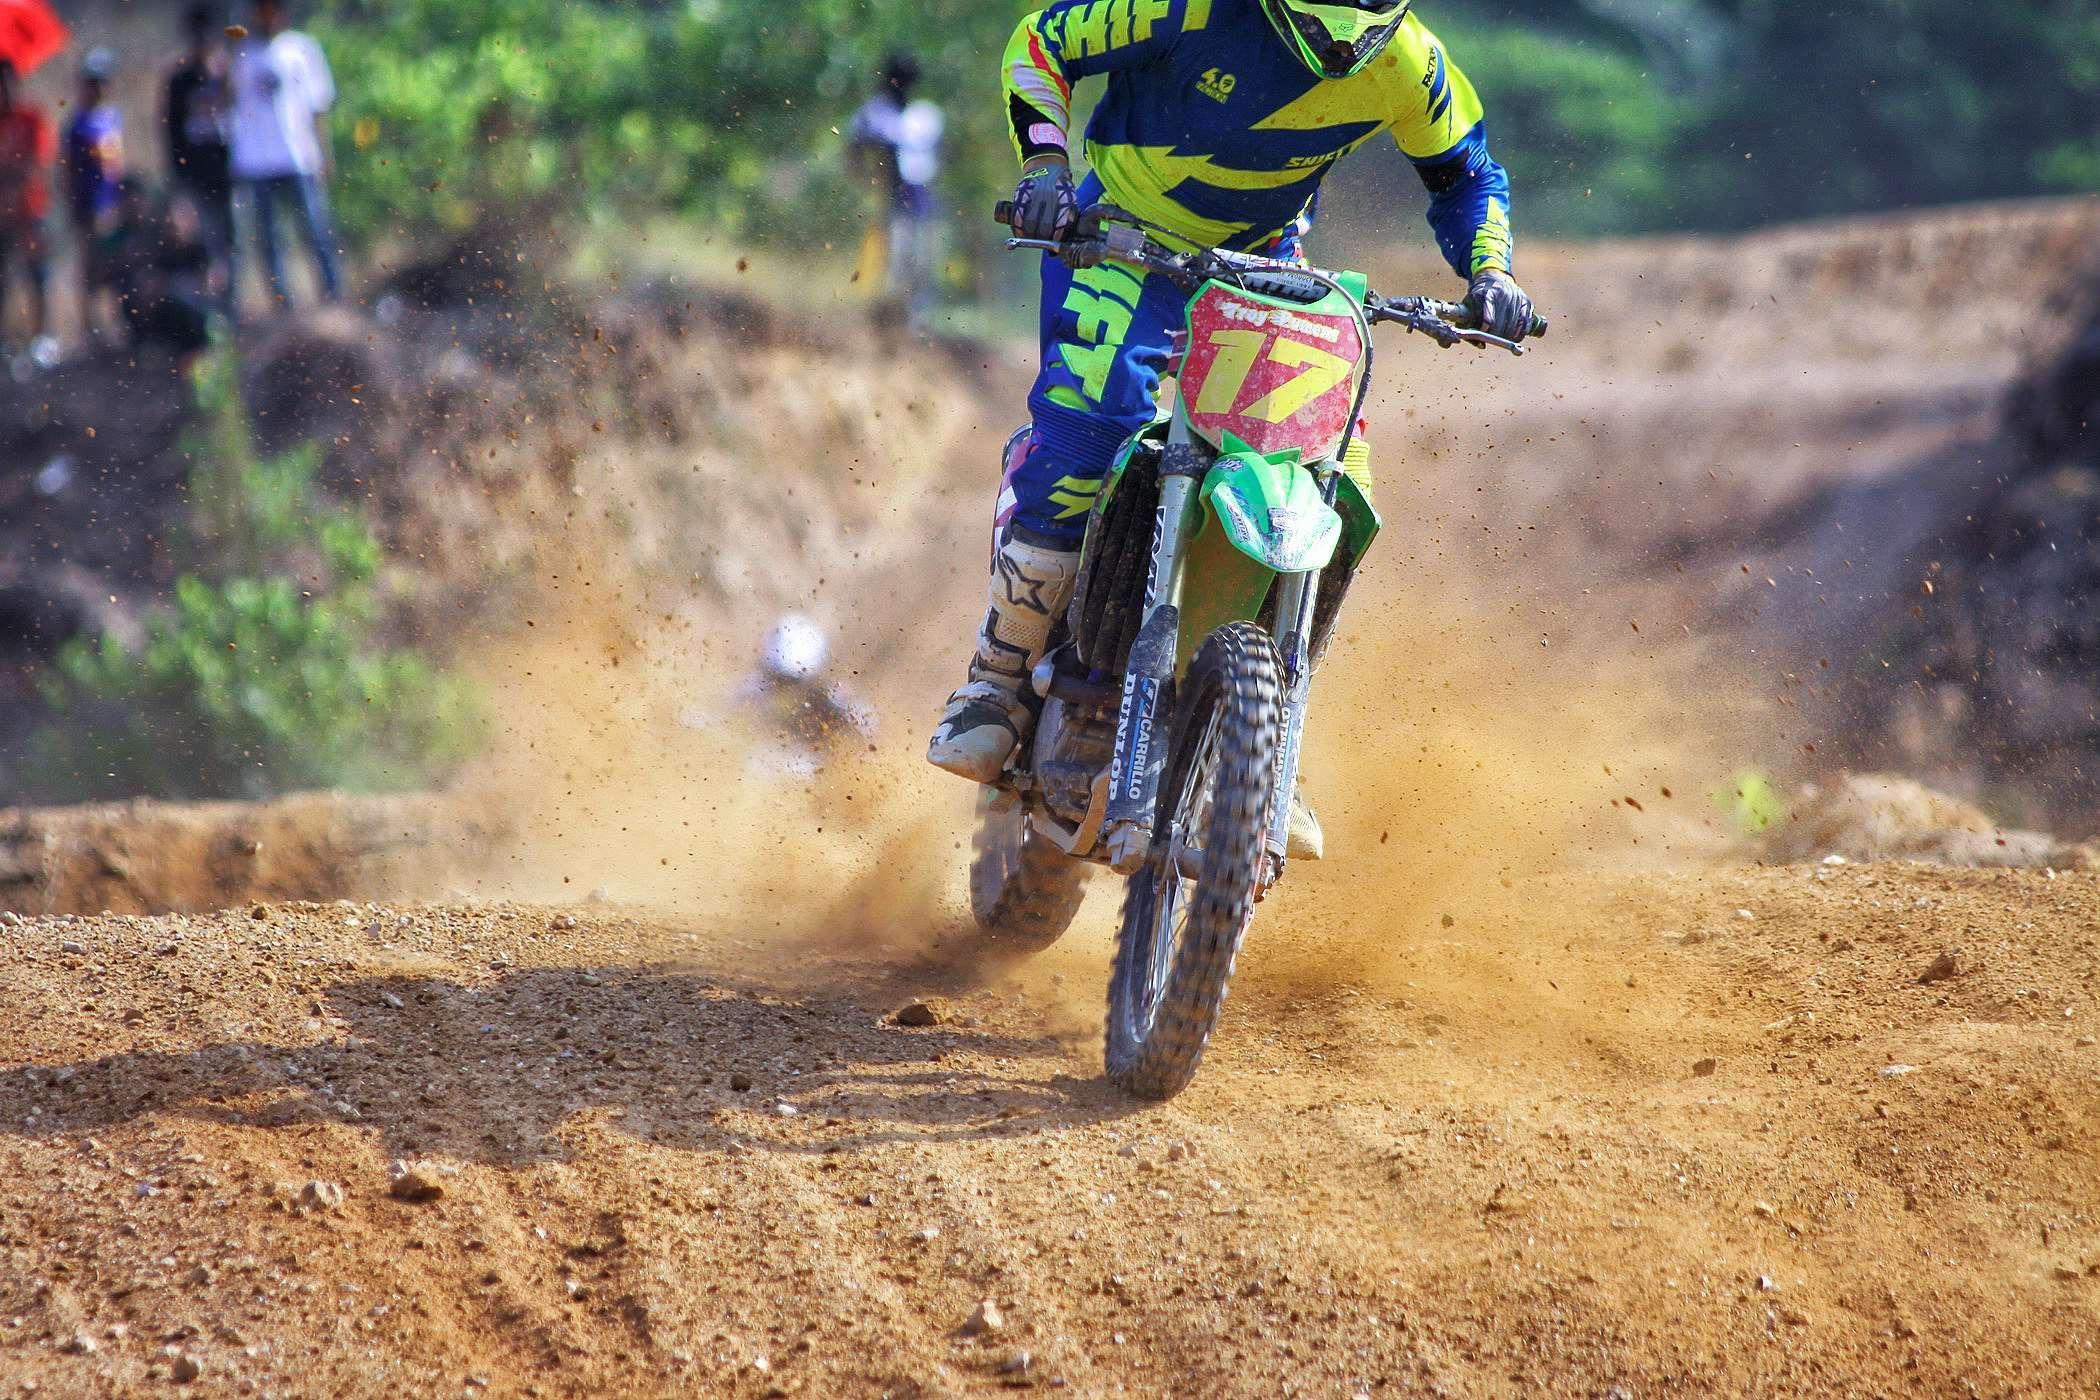 Biker Dirt Bike Dirt Road Man Motocross Motorbike Motorcycle